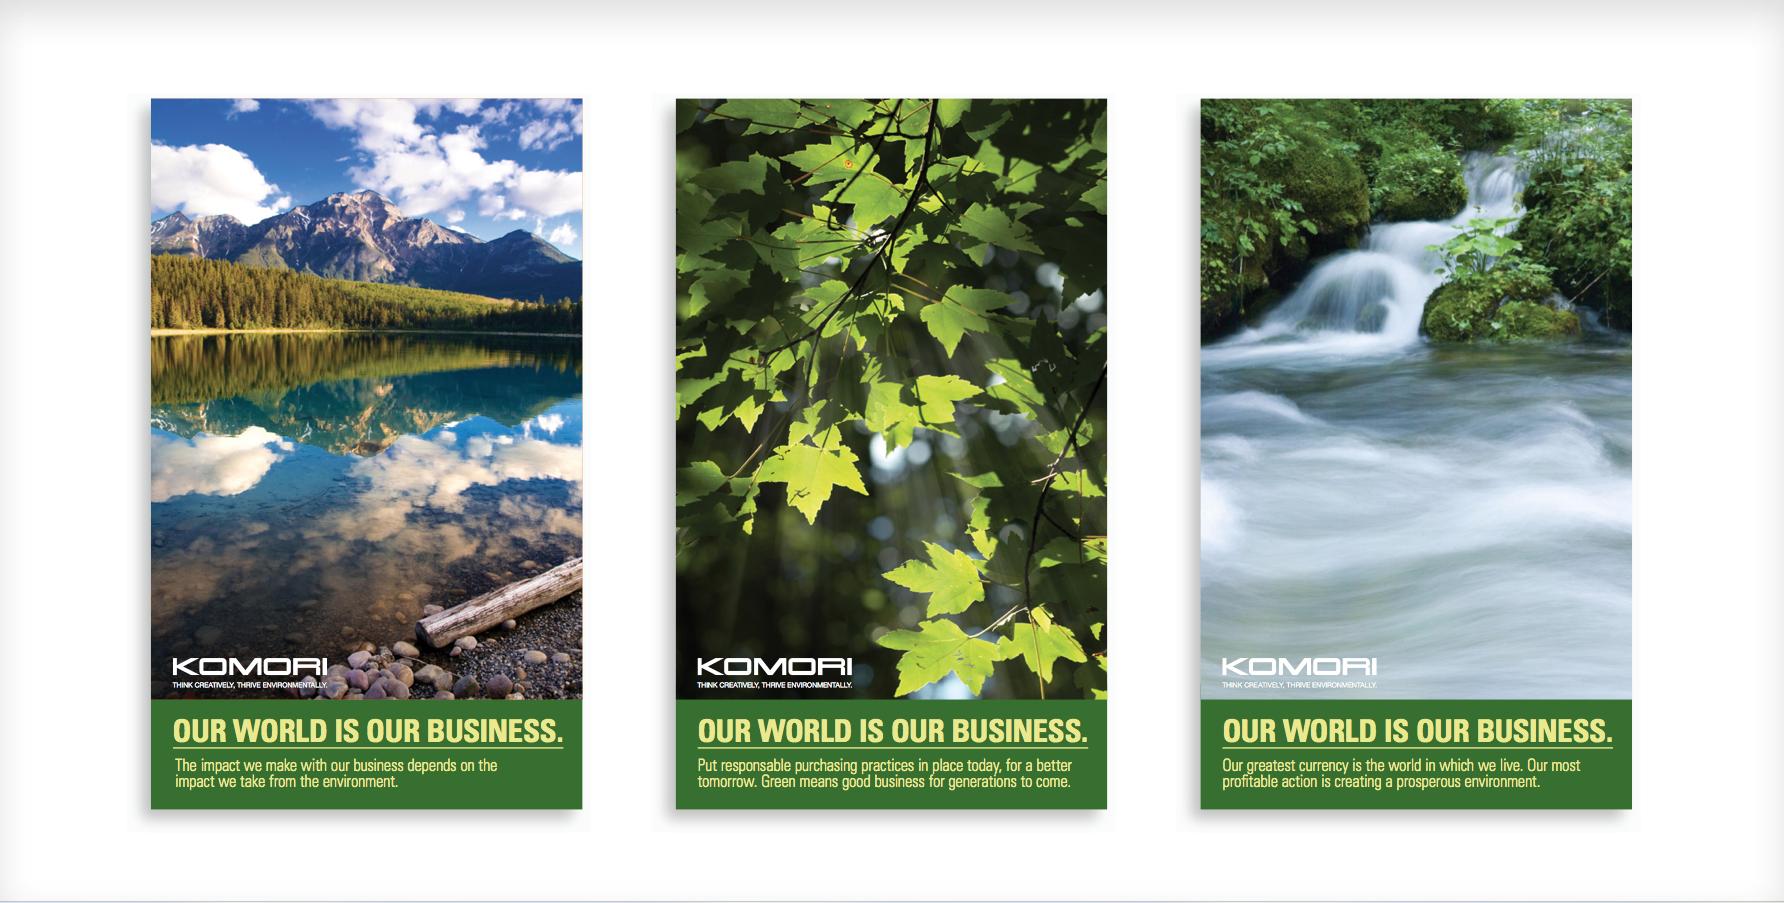 Komori Environmental Initiatives